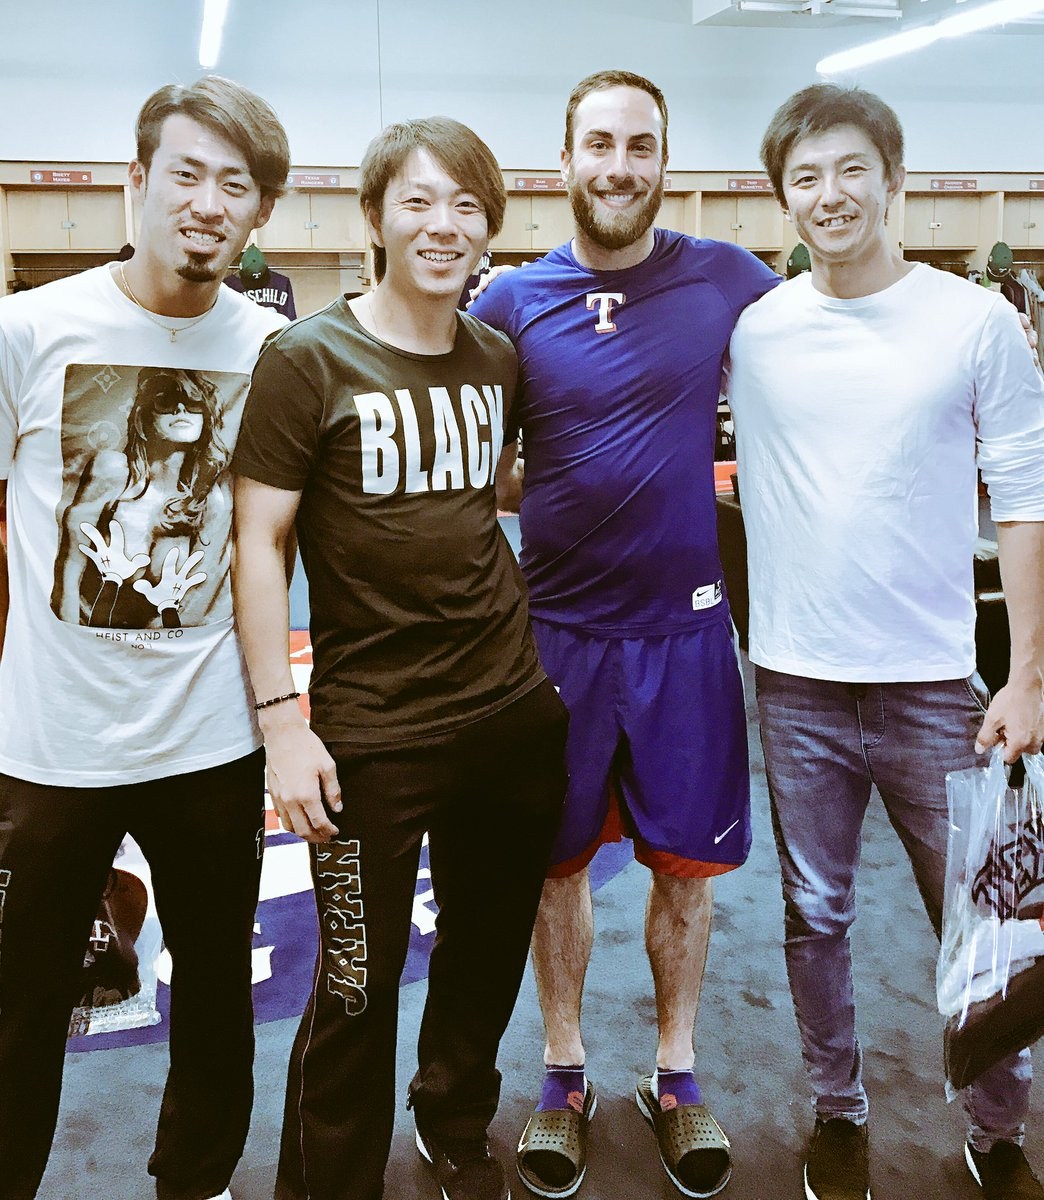 Great seeing my old Fighters teammates (Miyanishi & Masui) and meeting Ryo Akiyoshi, all pitching for team  . がんばってね